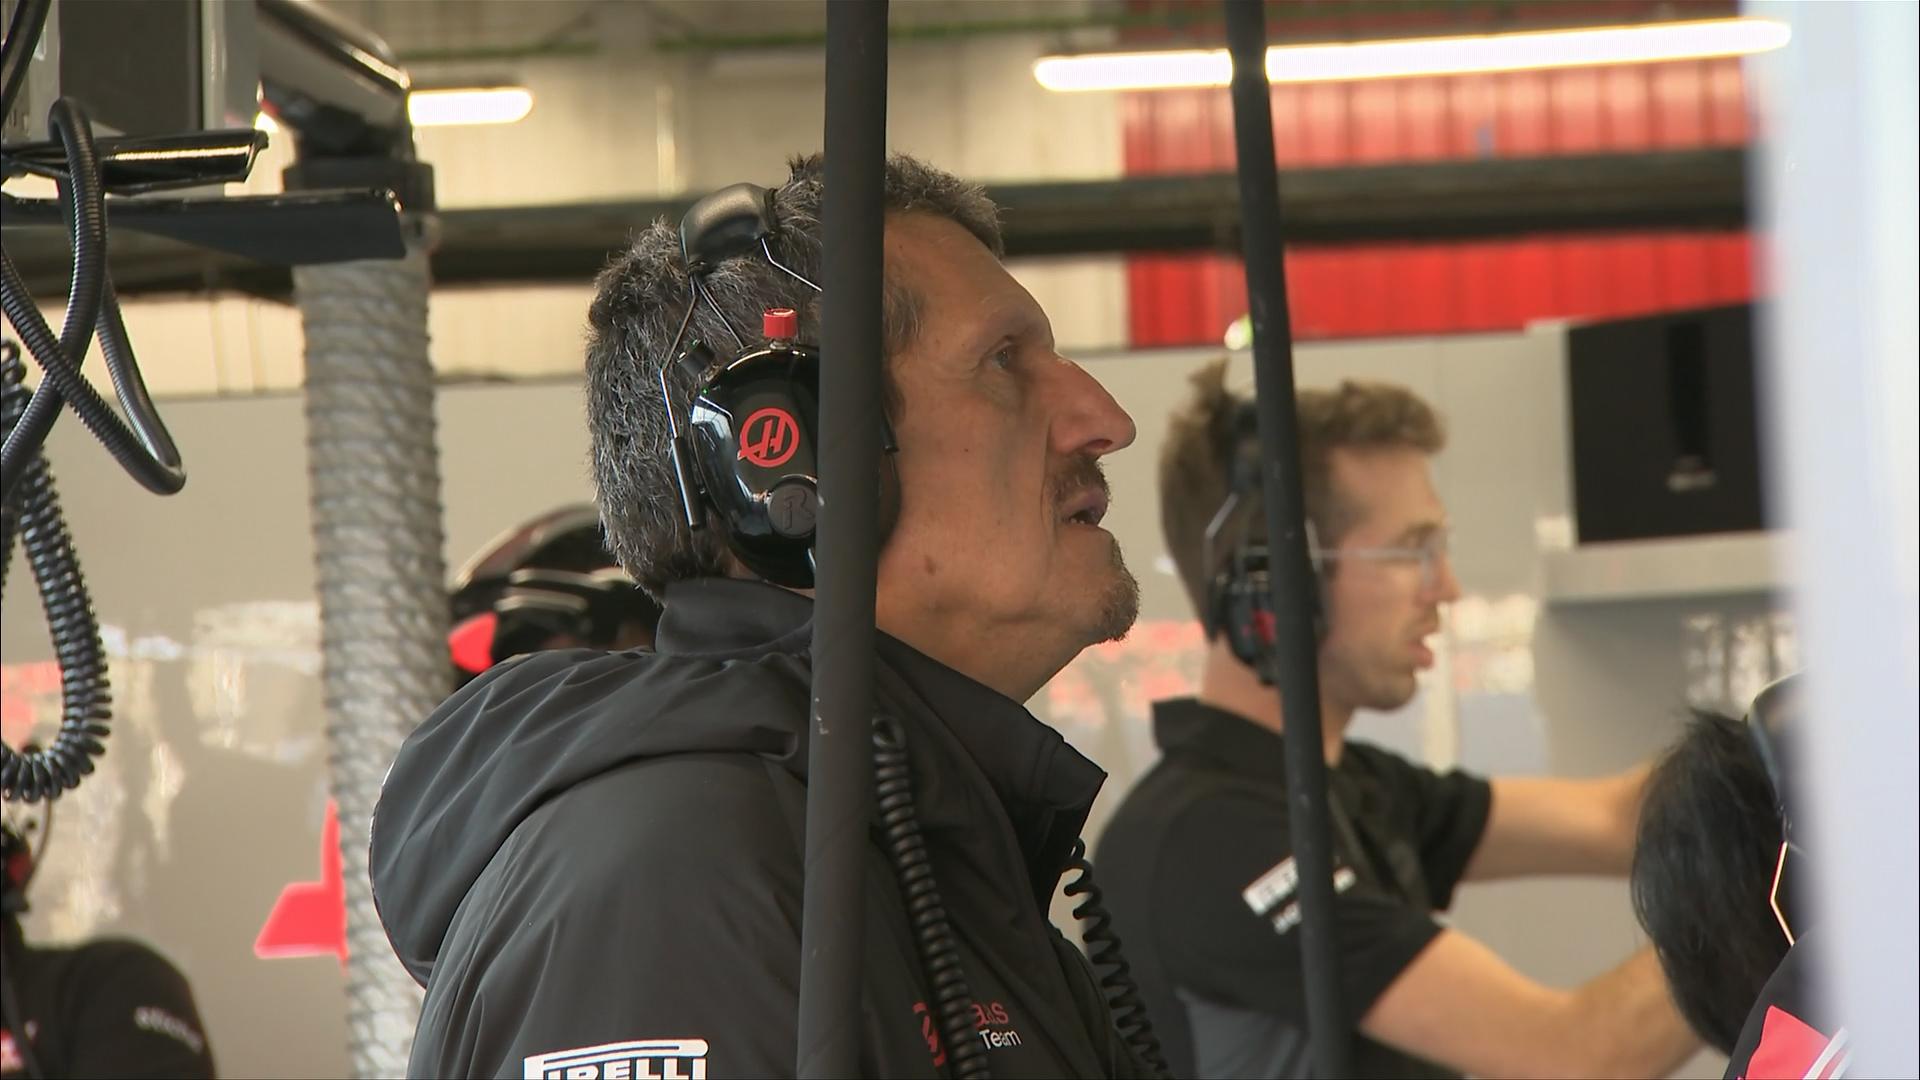 Romain Grosjean slides into gravel trap